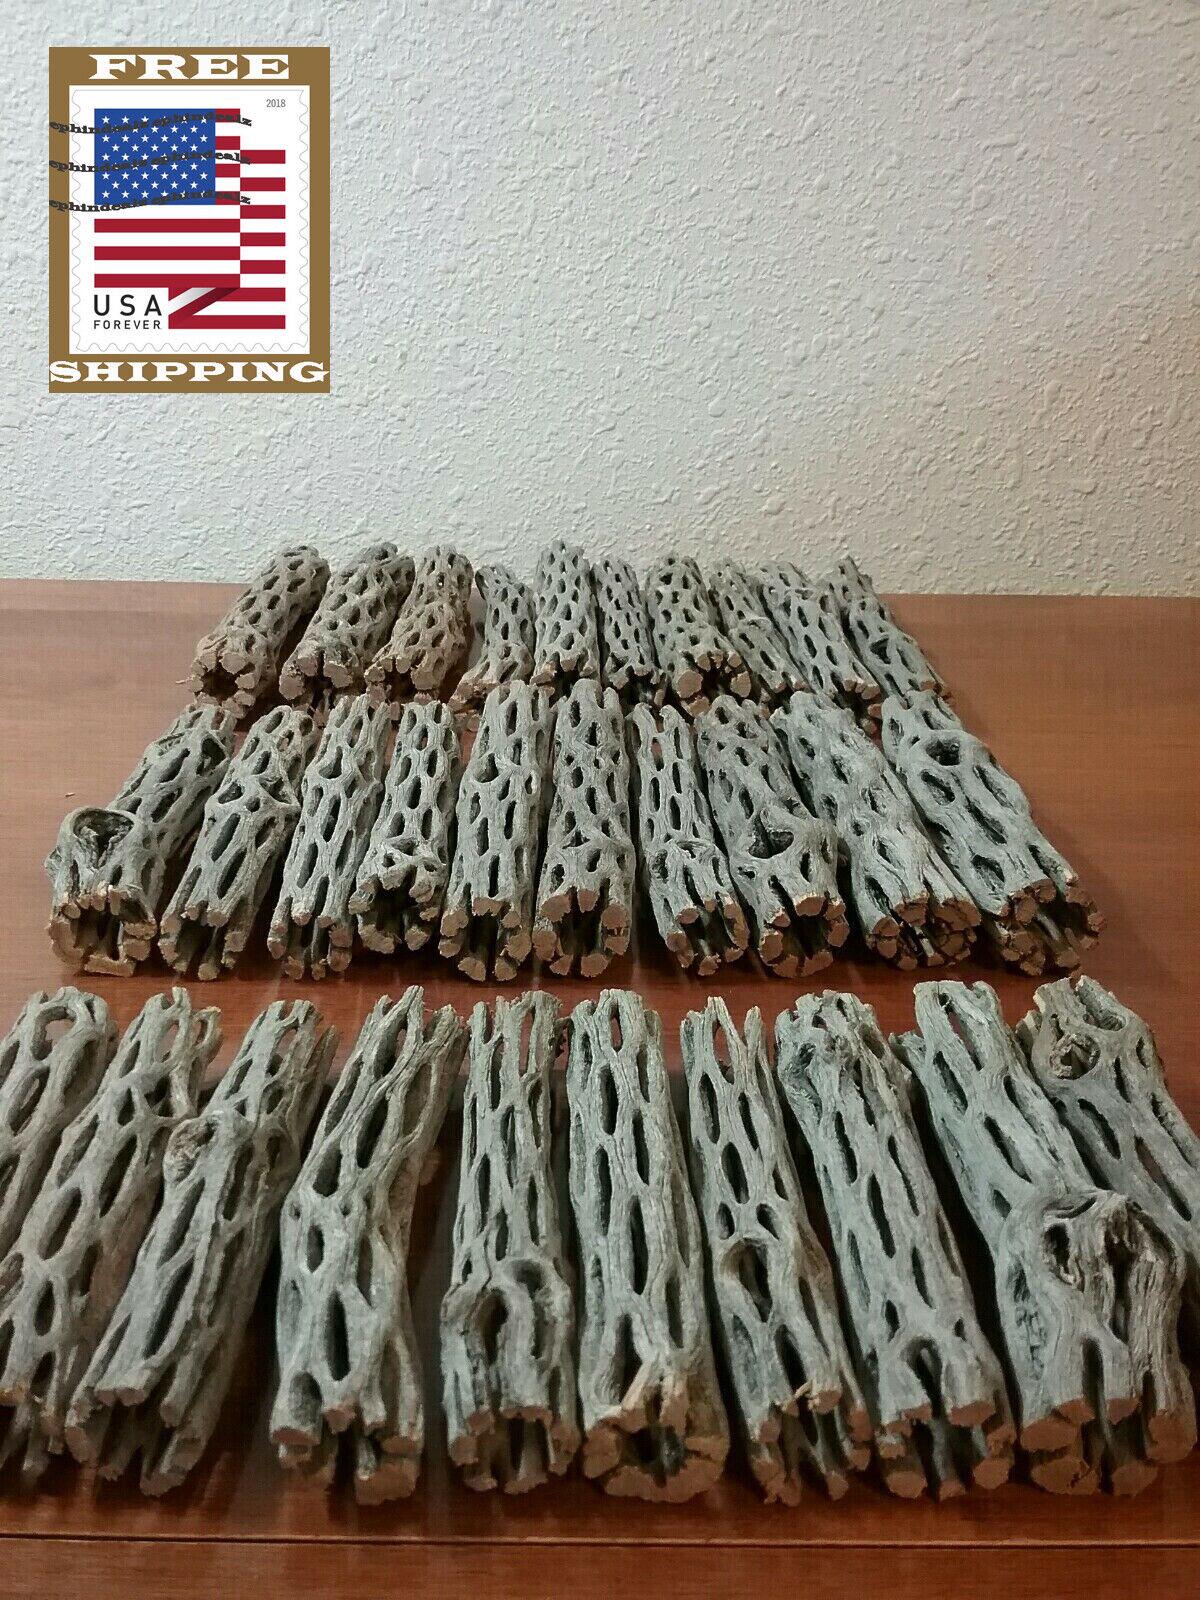 NEW 30 pcs CHOLLA Wood | 3 Sizes Multi-Pack | Organic Driftwood | Craft Aquarium